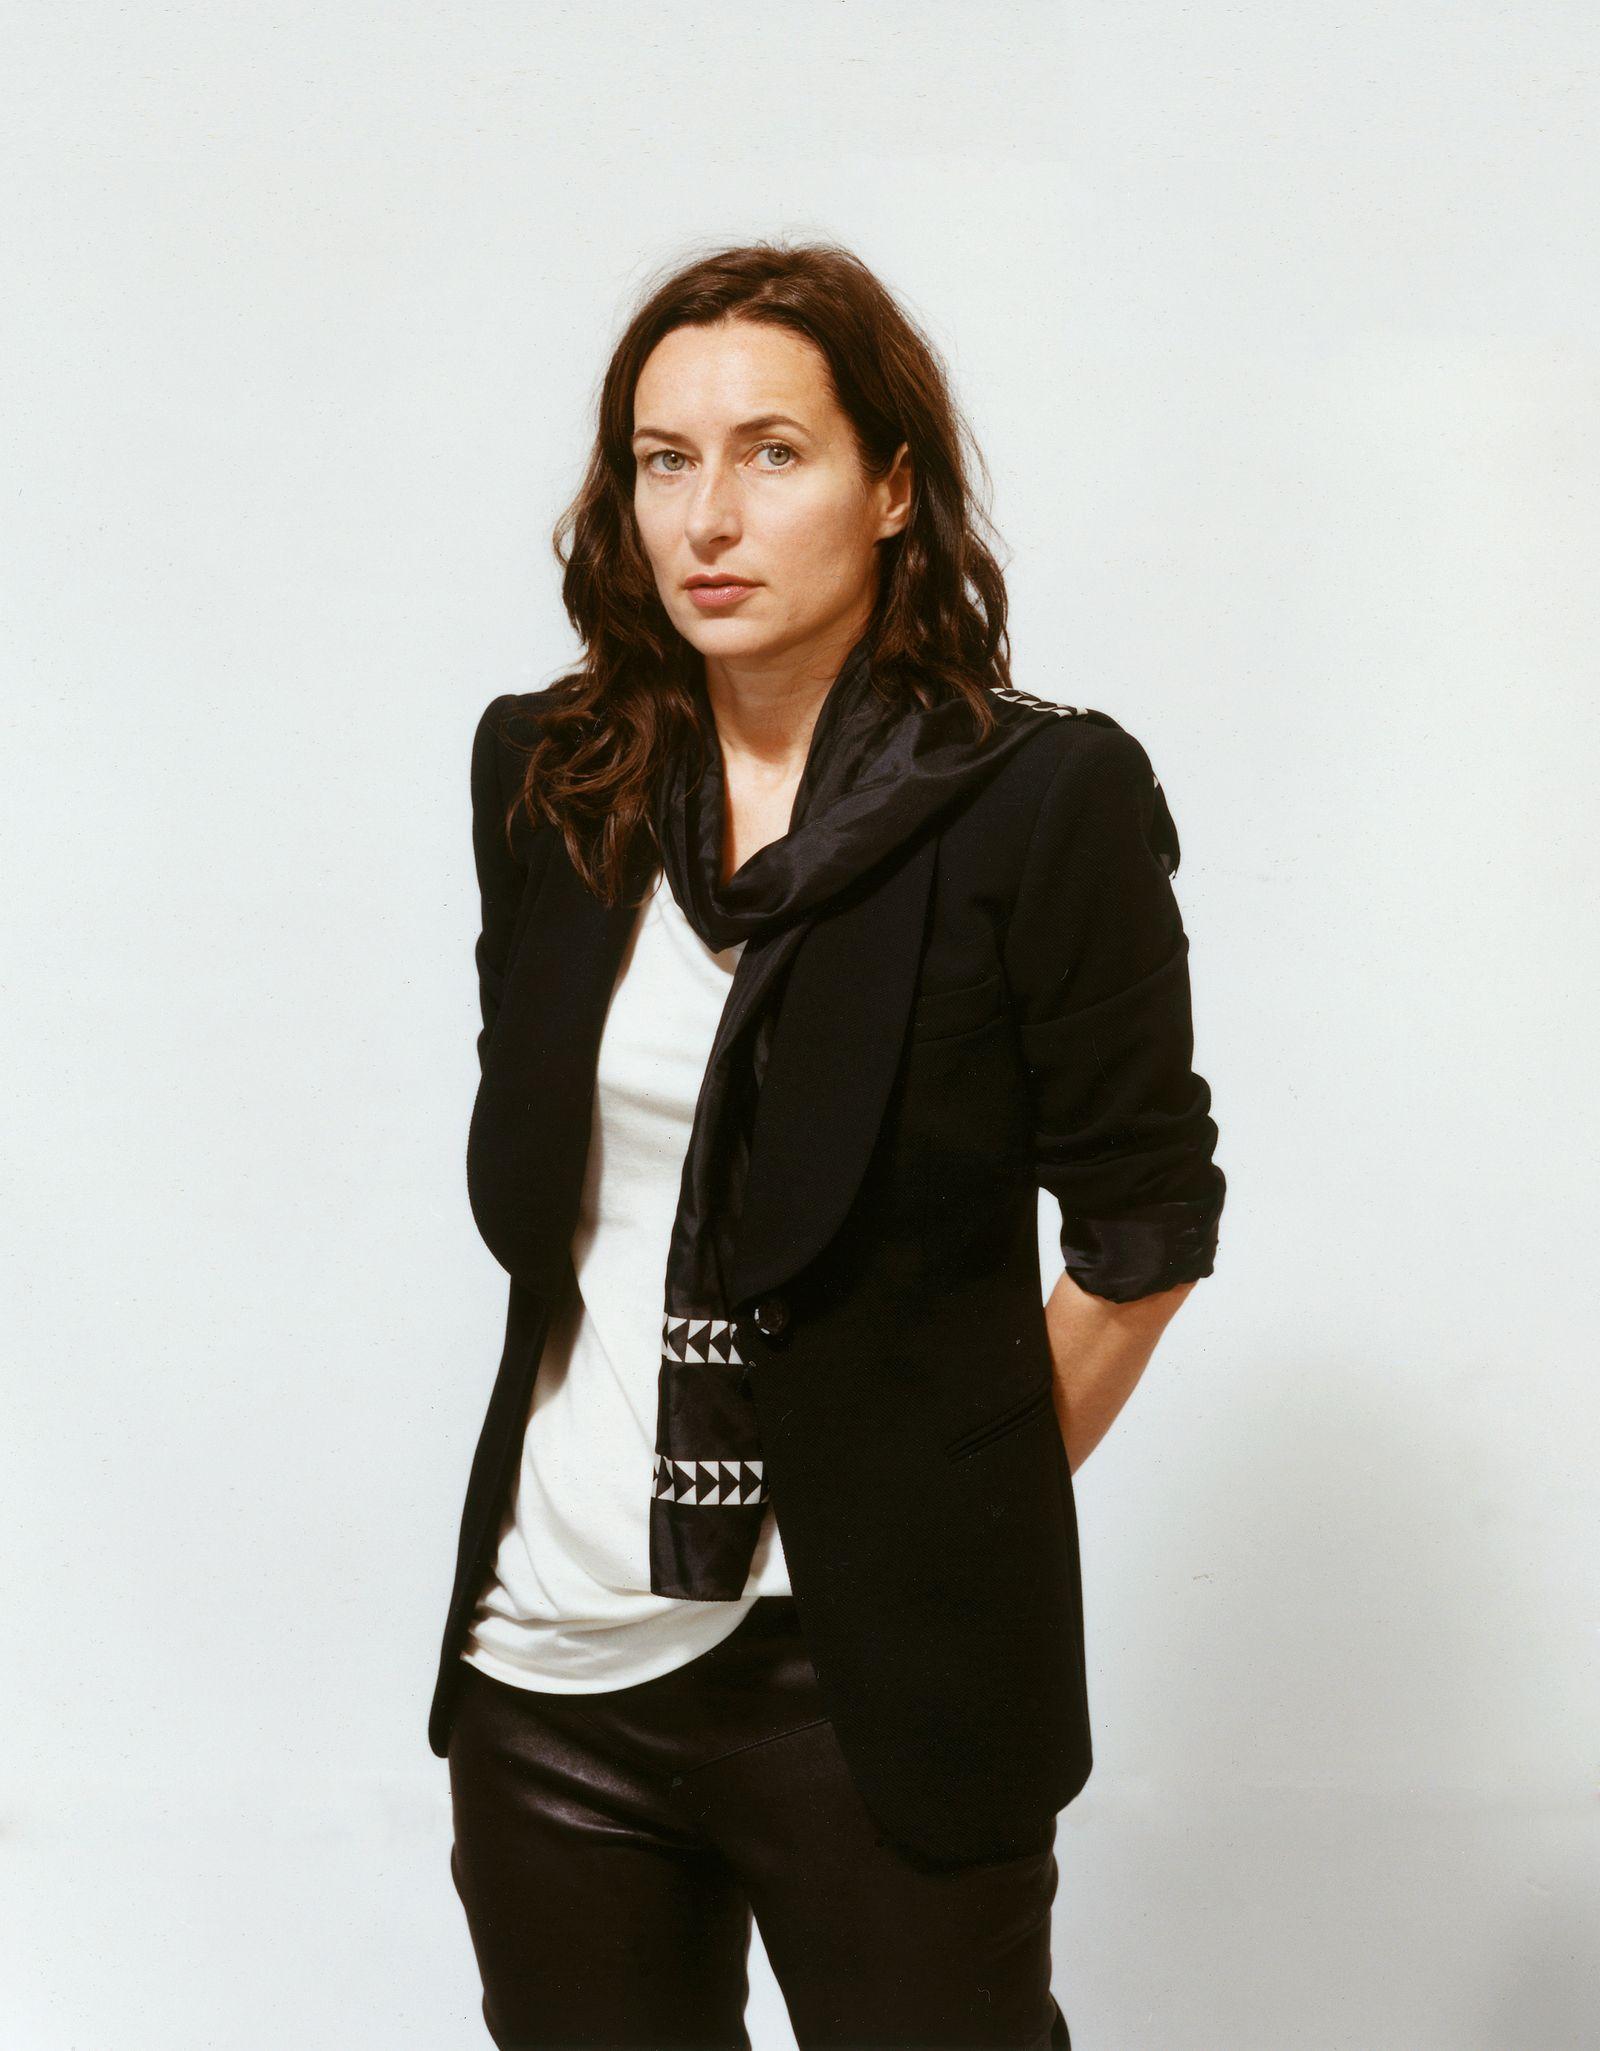 Josephine Meckseper/ Interview